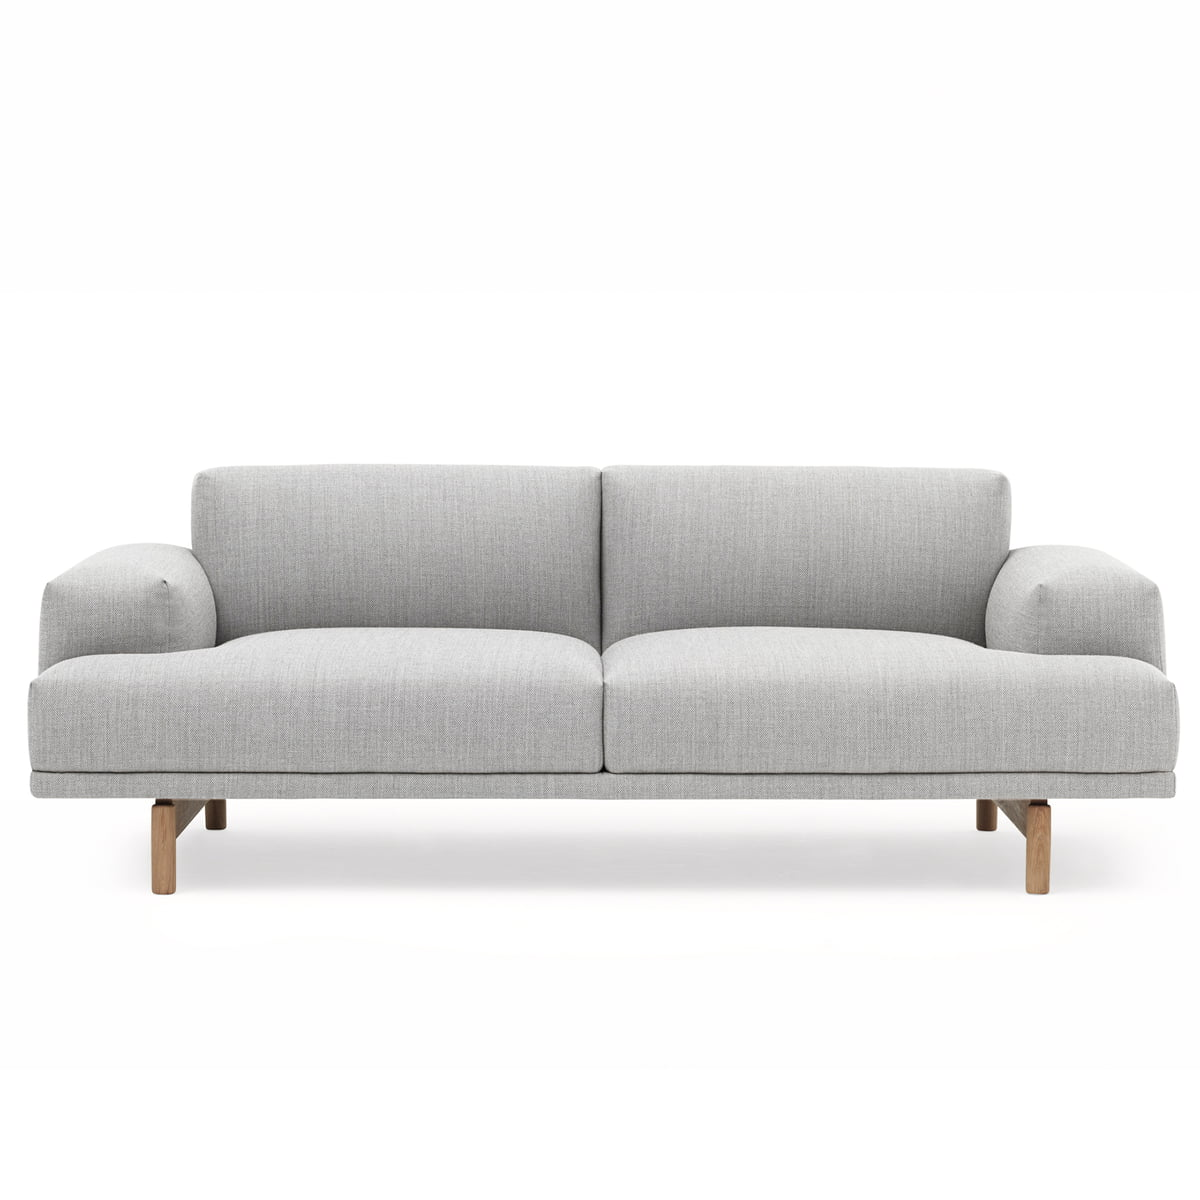 Muuto compose sofa 2 sitzer vancouver 14 eiche frei